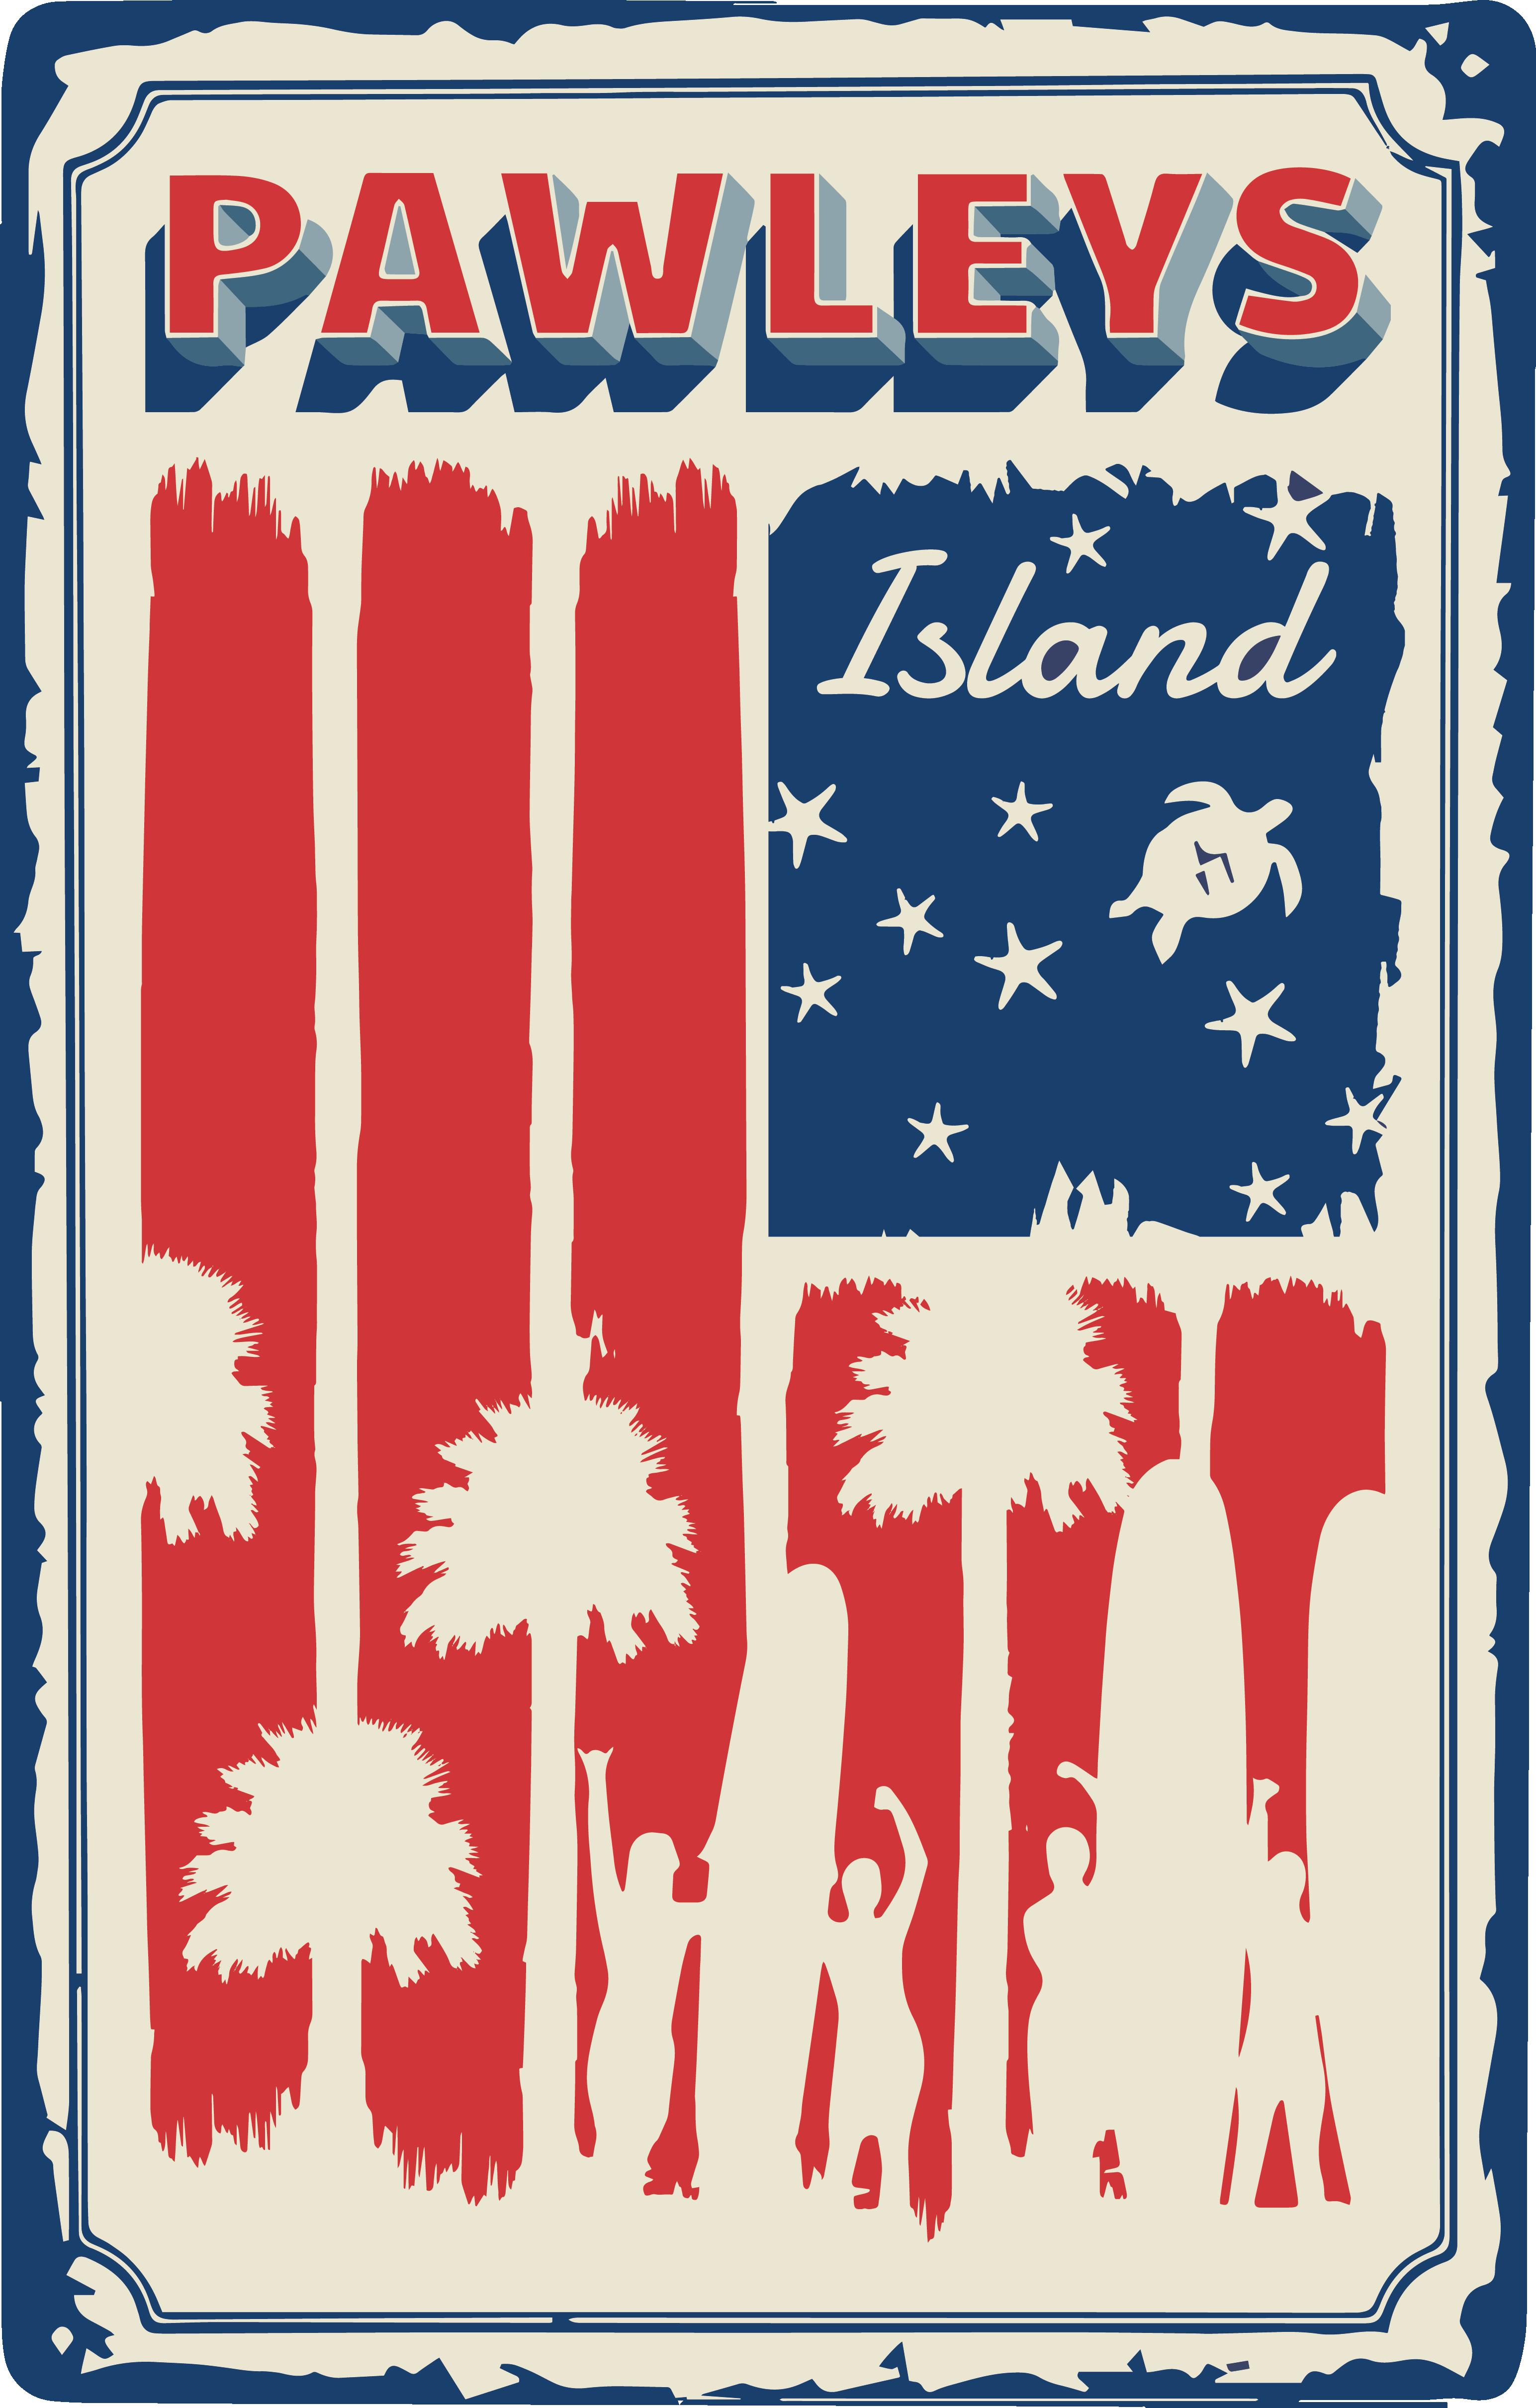 Pawleys Island 4th of July T-shirt